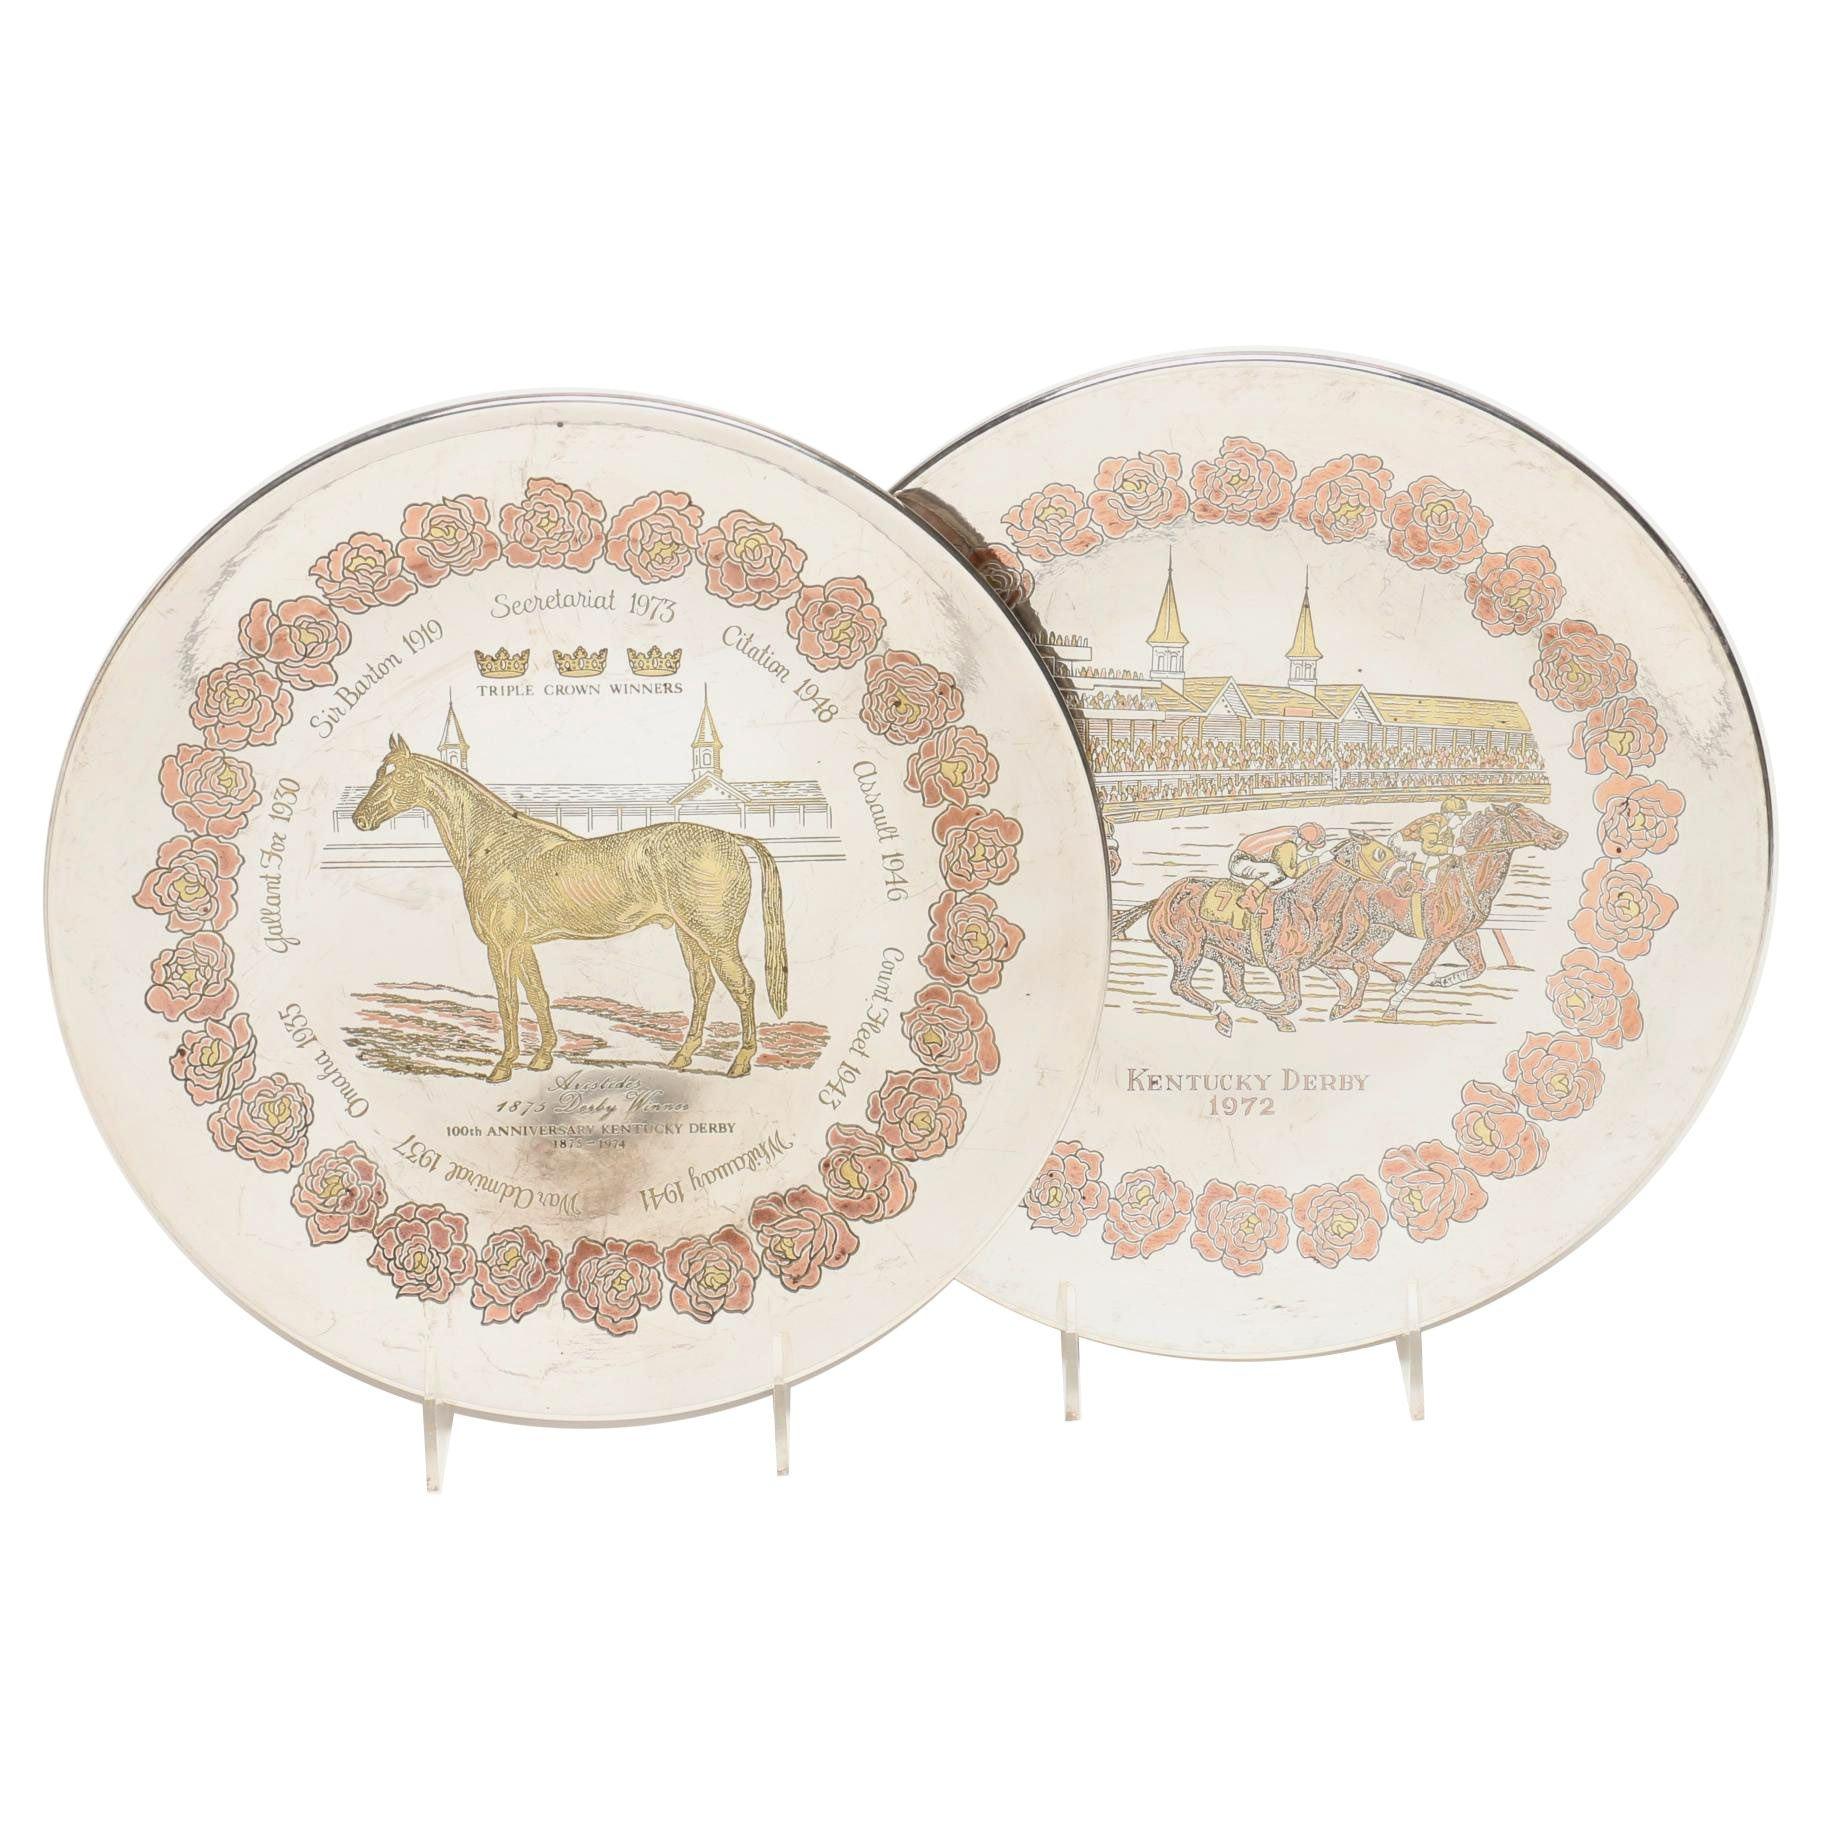 Reed & Barton Limited Edition Kentucky Derby Damascene Plates